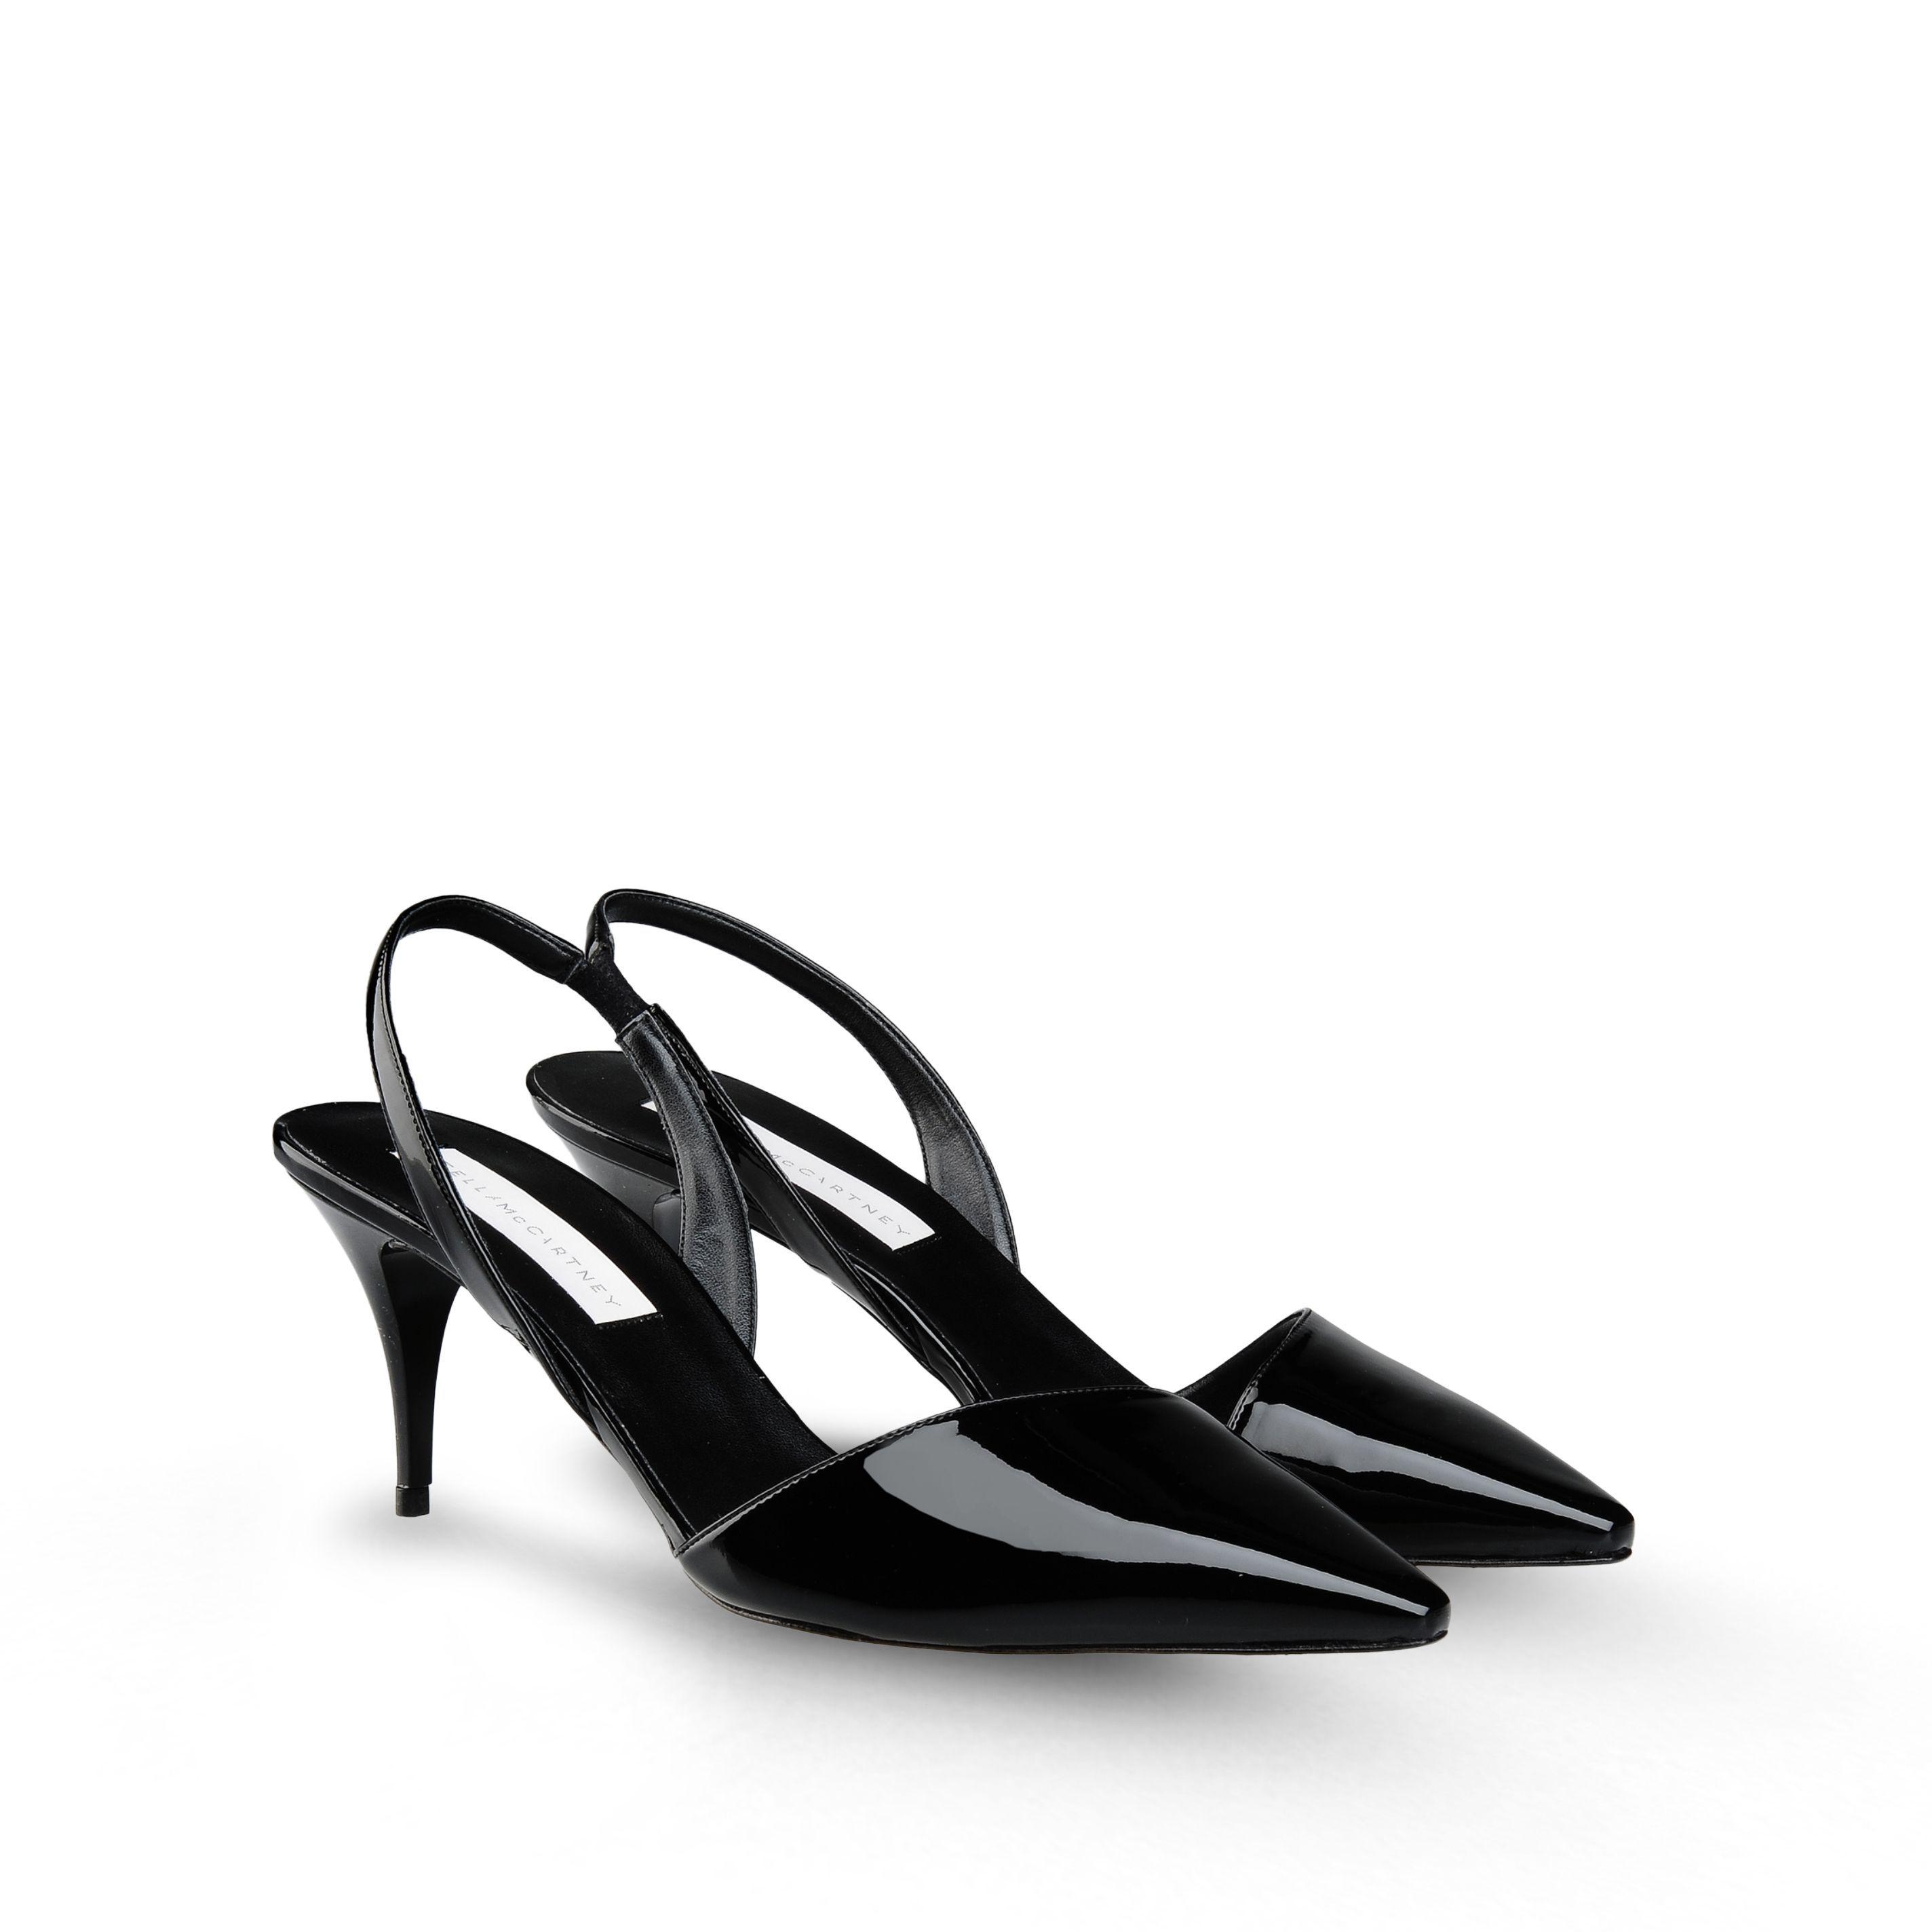 c8cb4a0fd11a Women s STELLA McCARTNEY Slingbacks - Shoes - Shop on the Official Online  Store